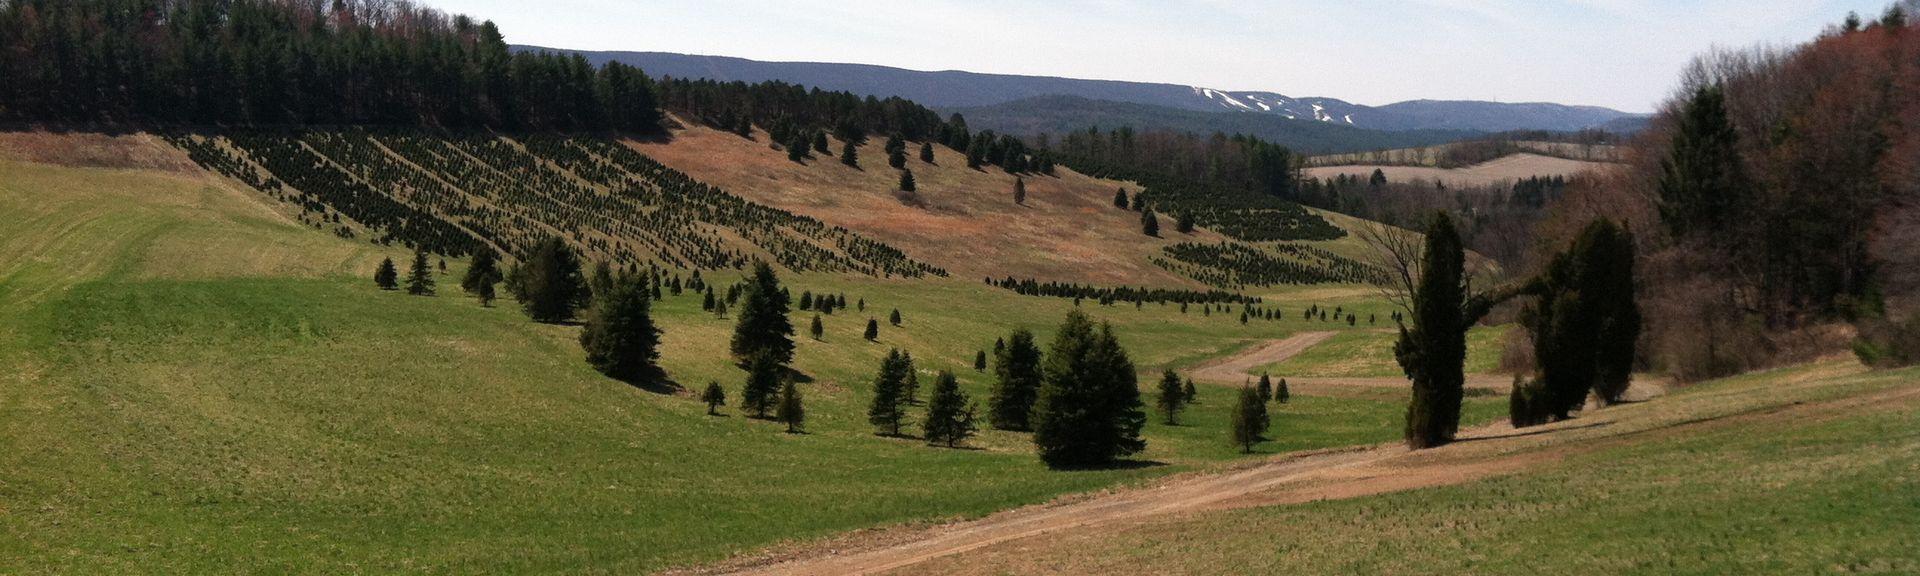 Blue Mountain (skigebied), Kunkletown, Pennsylvania, Verenigde Staten